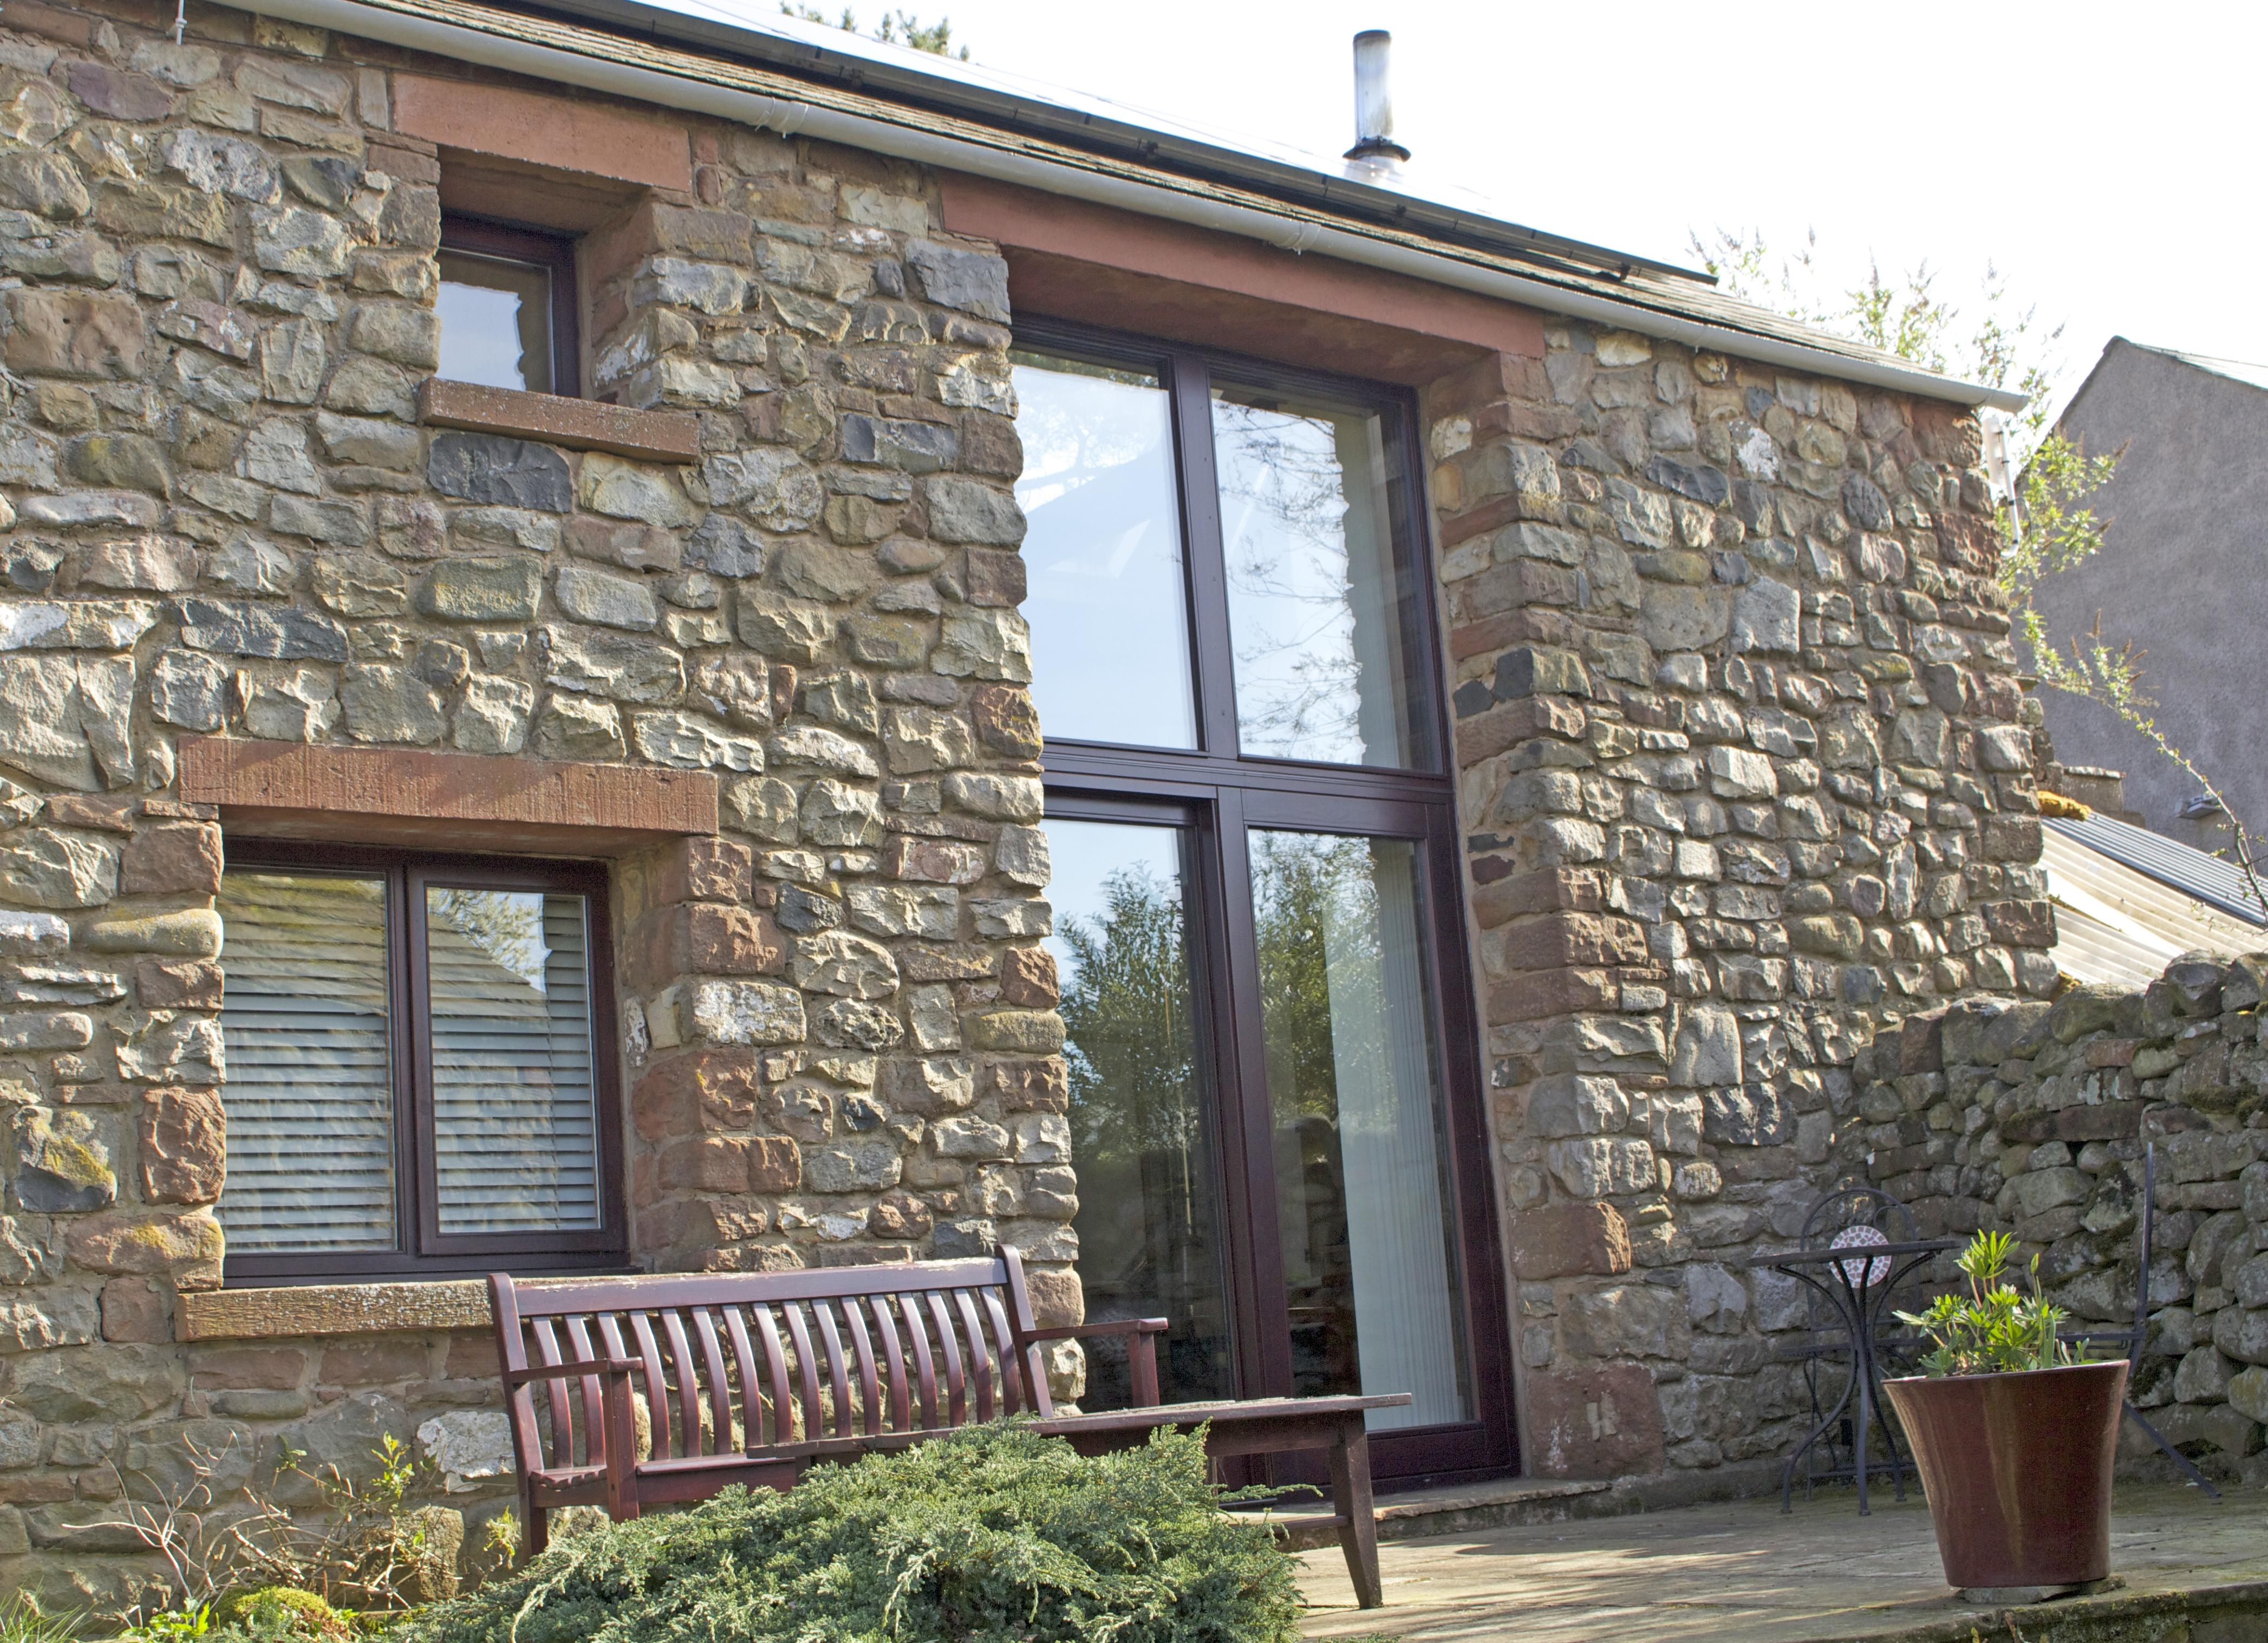 Quality timber Patio Doors and windows from AJ&D Chapelhow Ltd